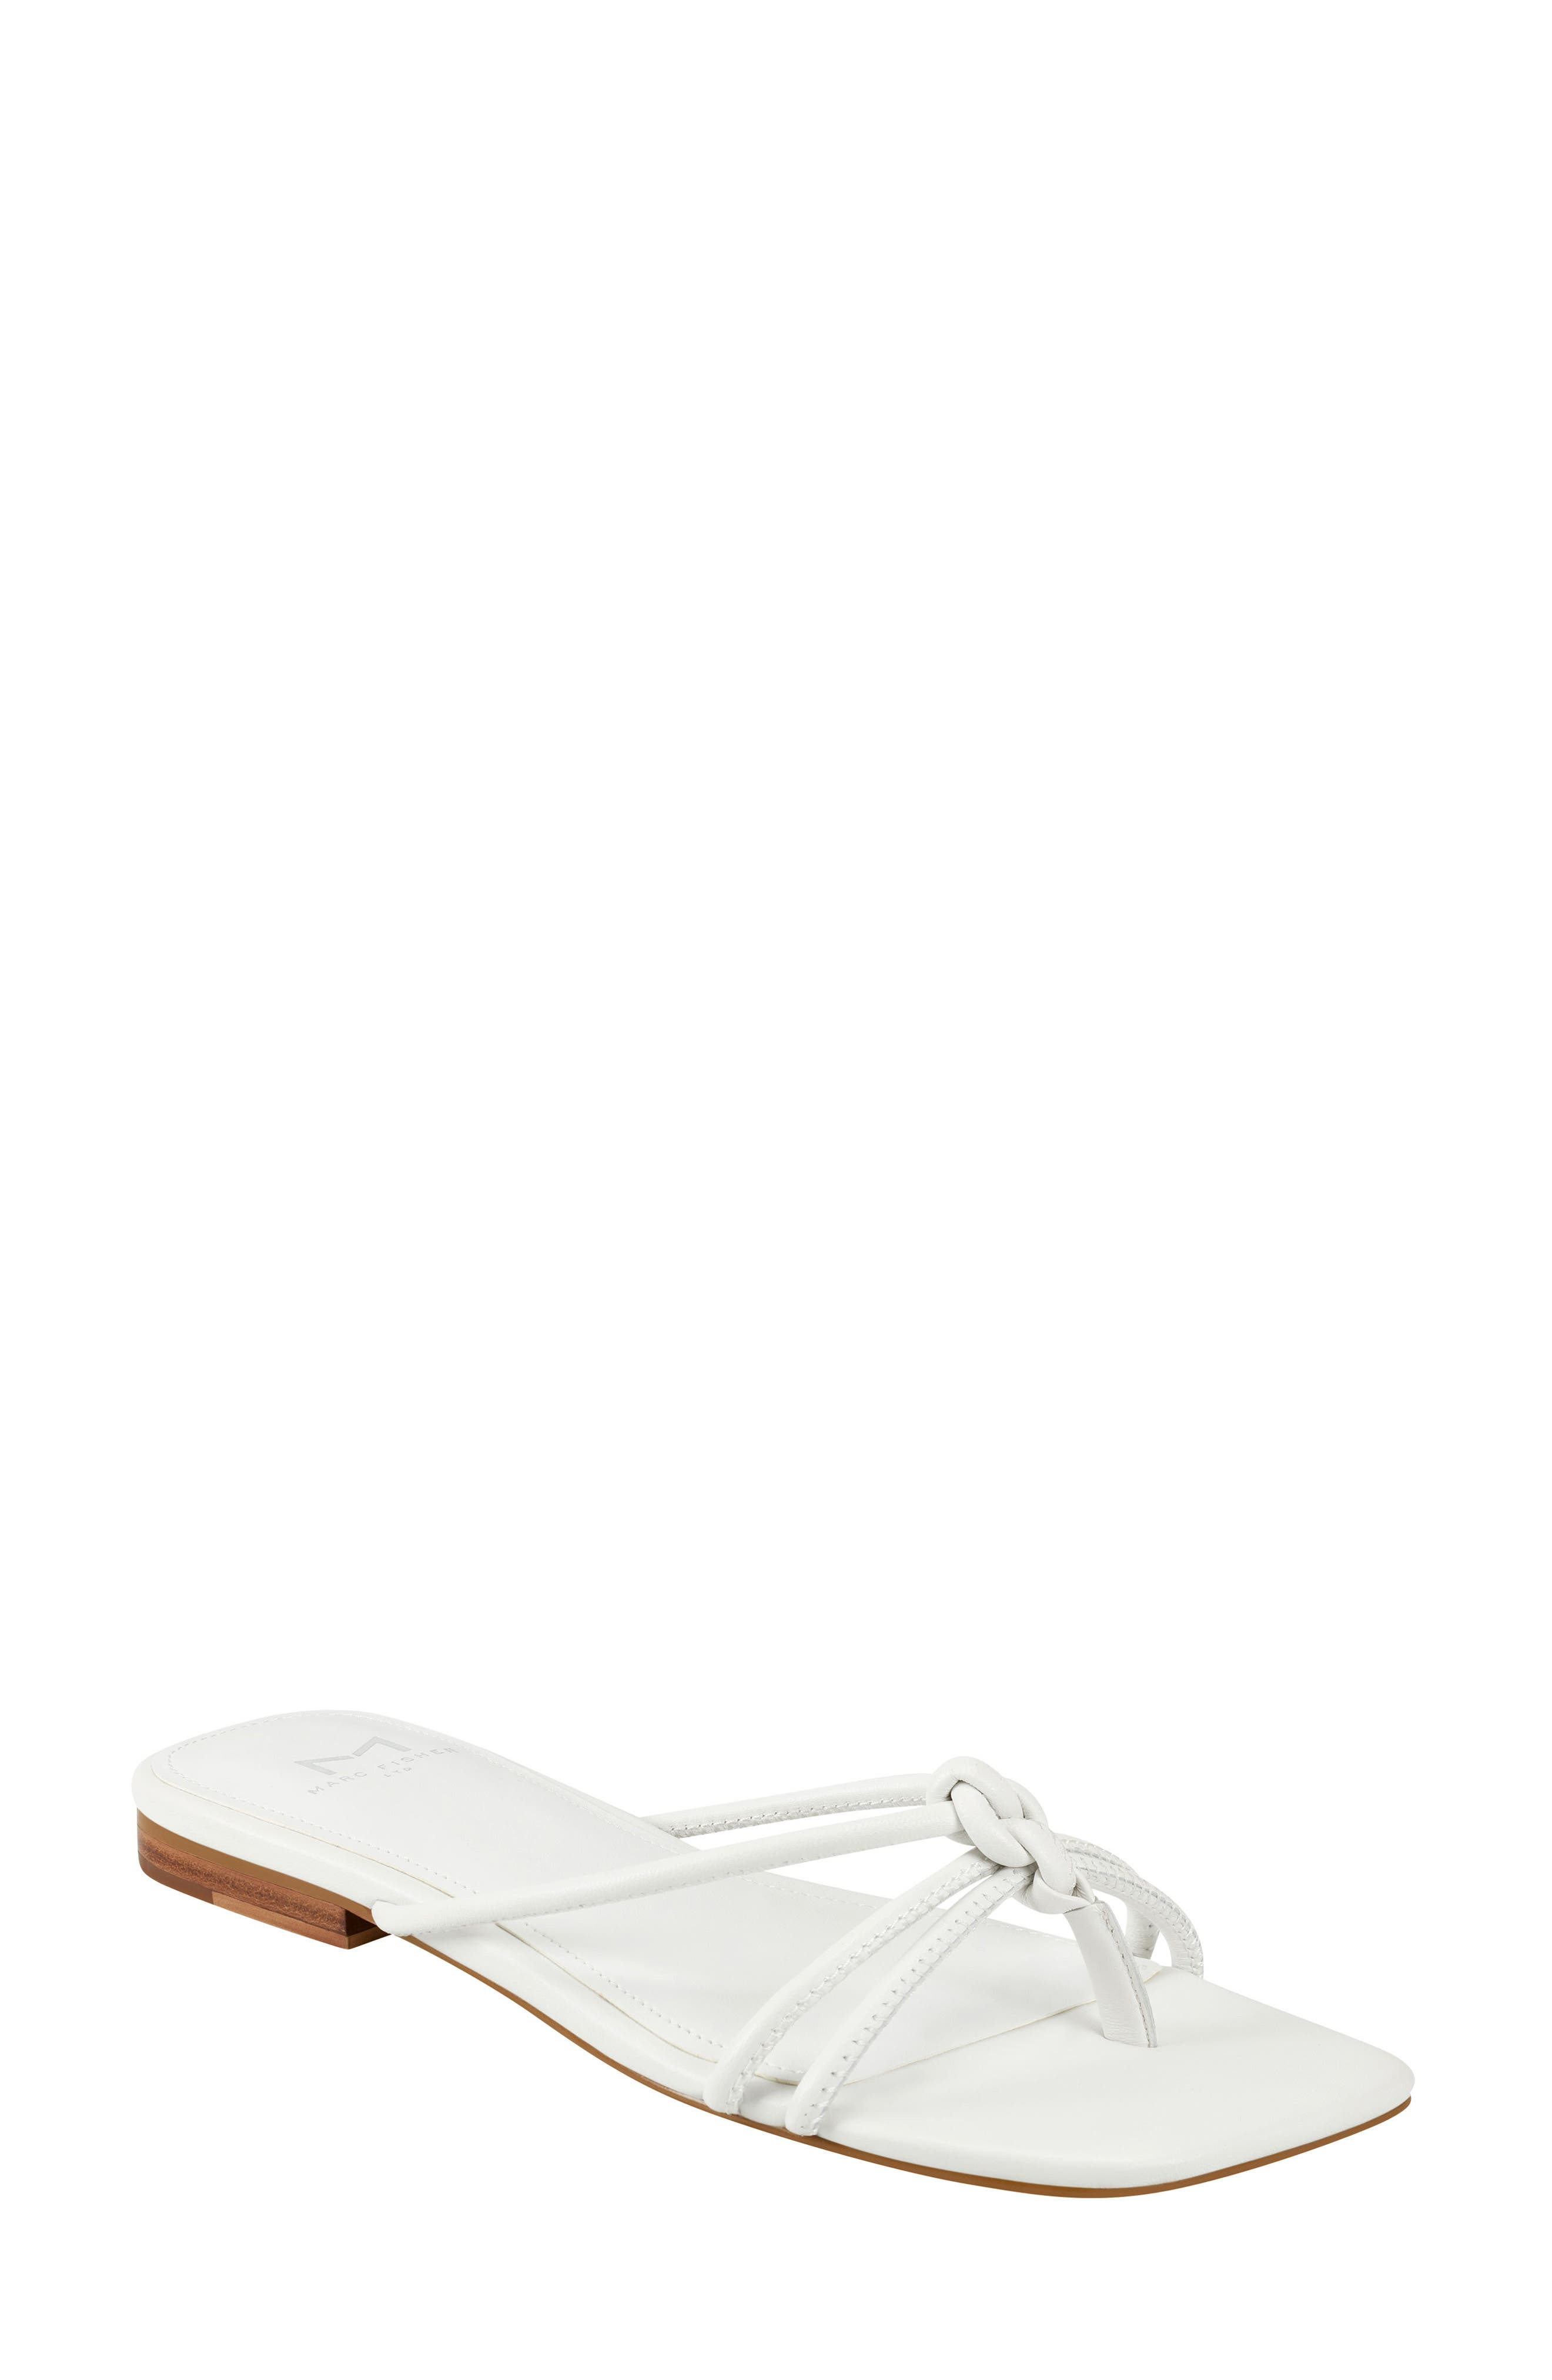 Marc Fisher LTD Sandals and Flip-Flops